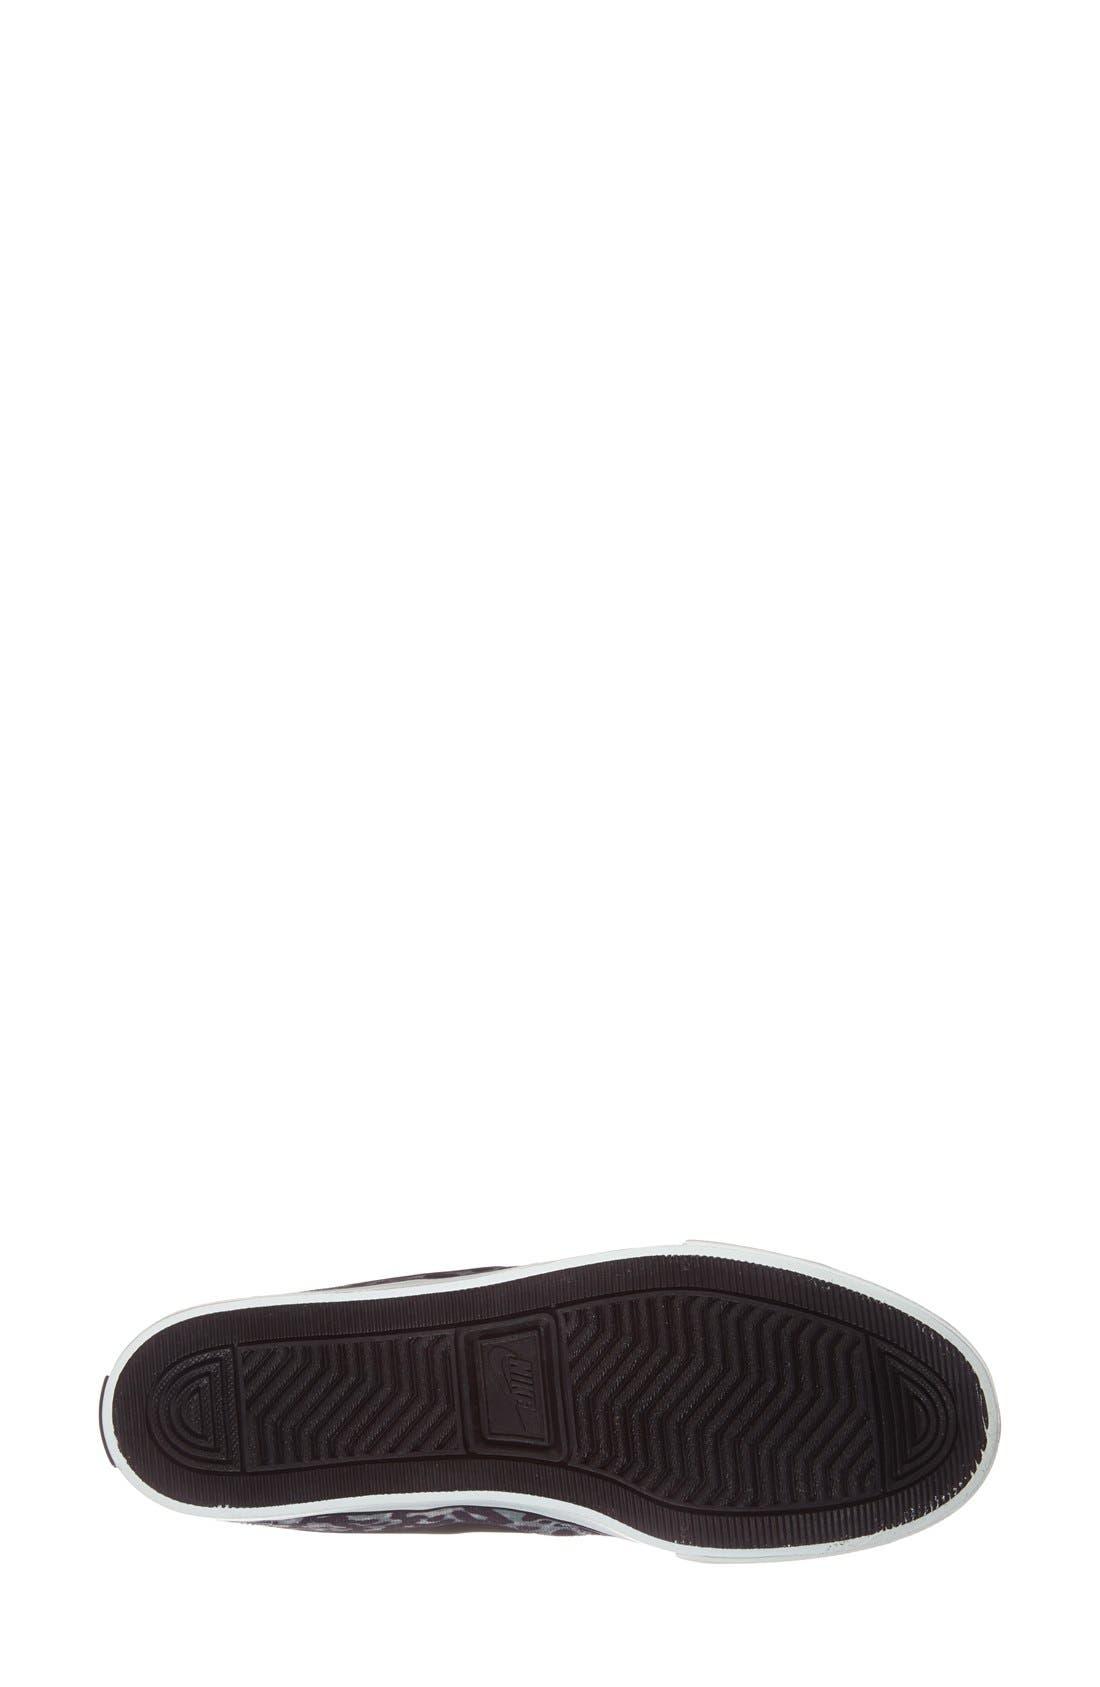 Alternate Image 4  - Nike 'Primo - Court' Printed Canvas Sneaker (Women)